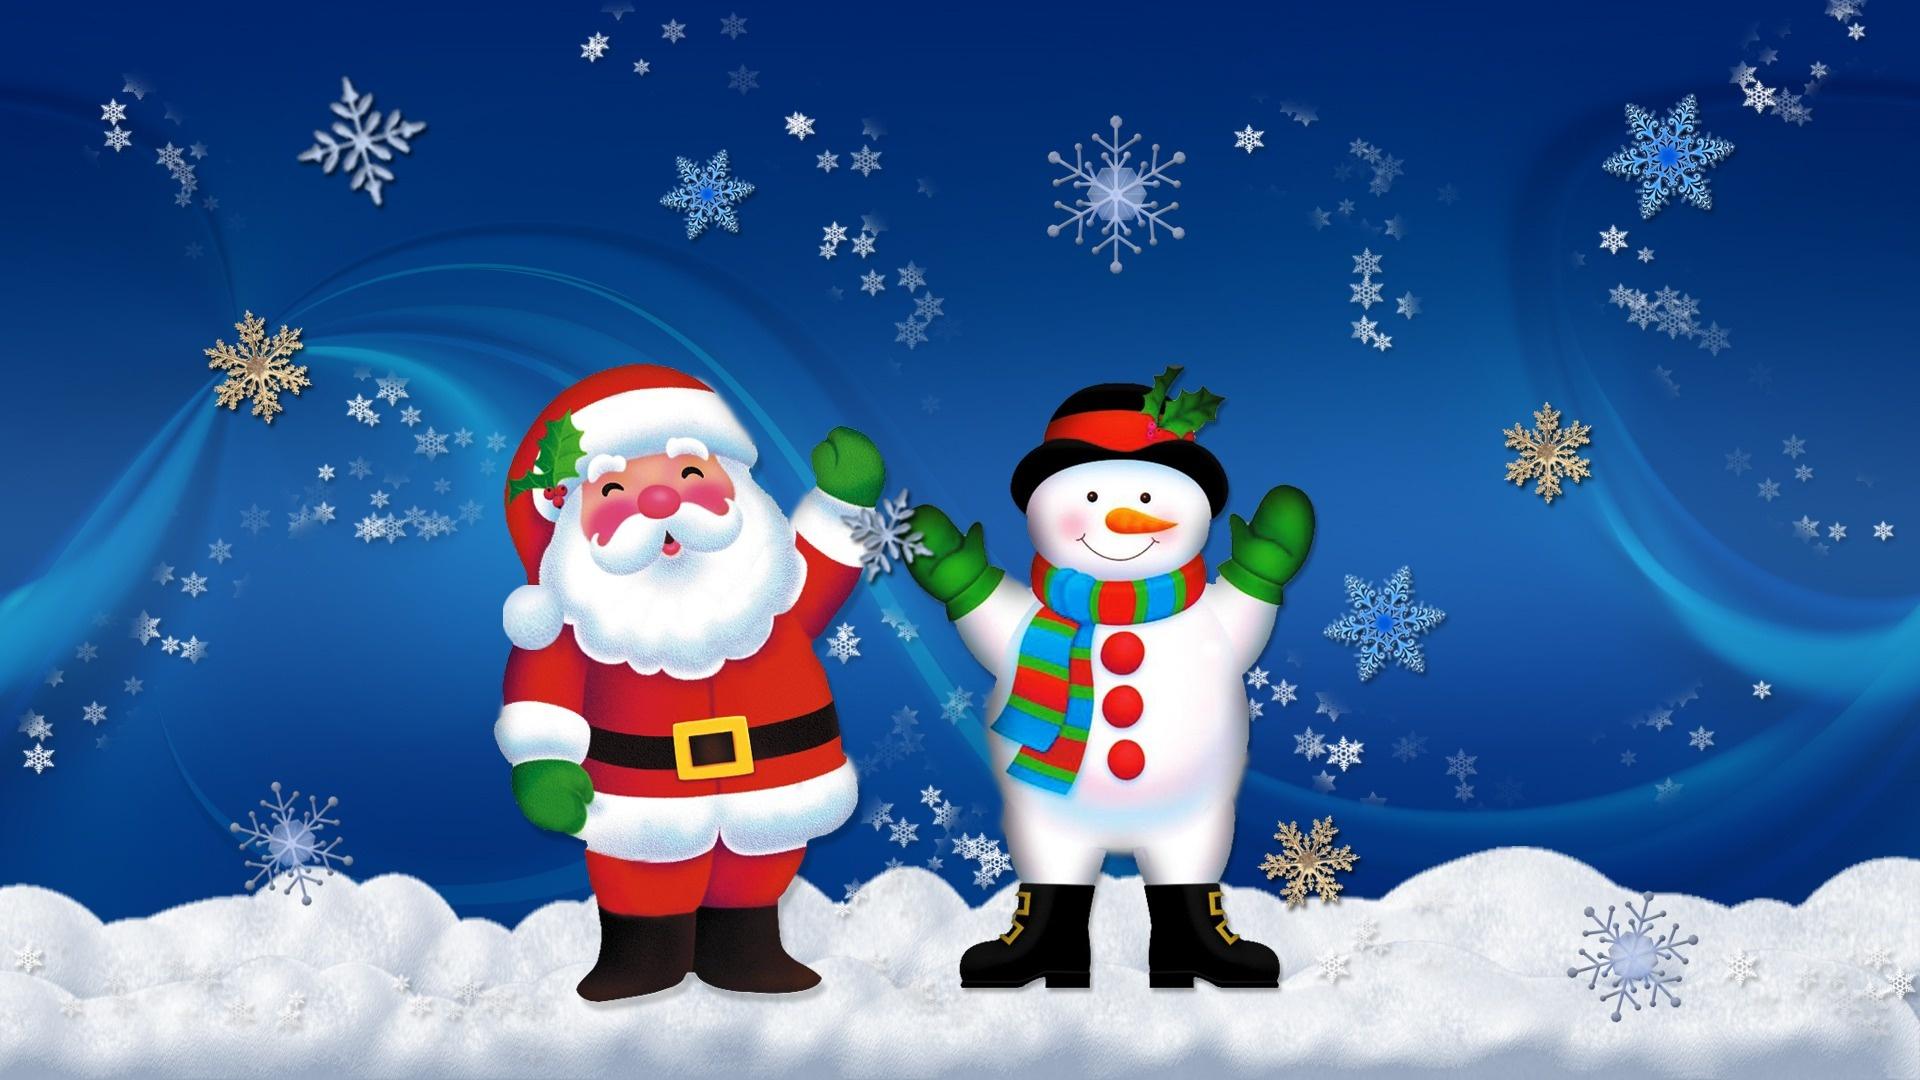 Screensavers | Free Christmas Screensavers for Mac & Vista | Desktop ...